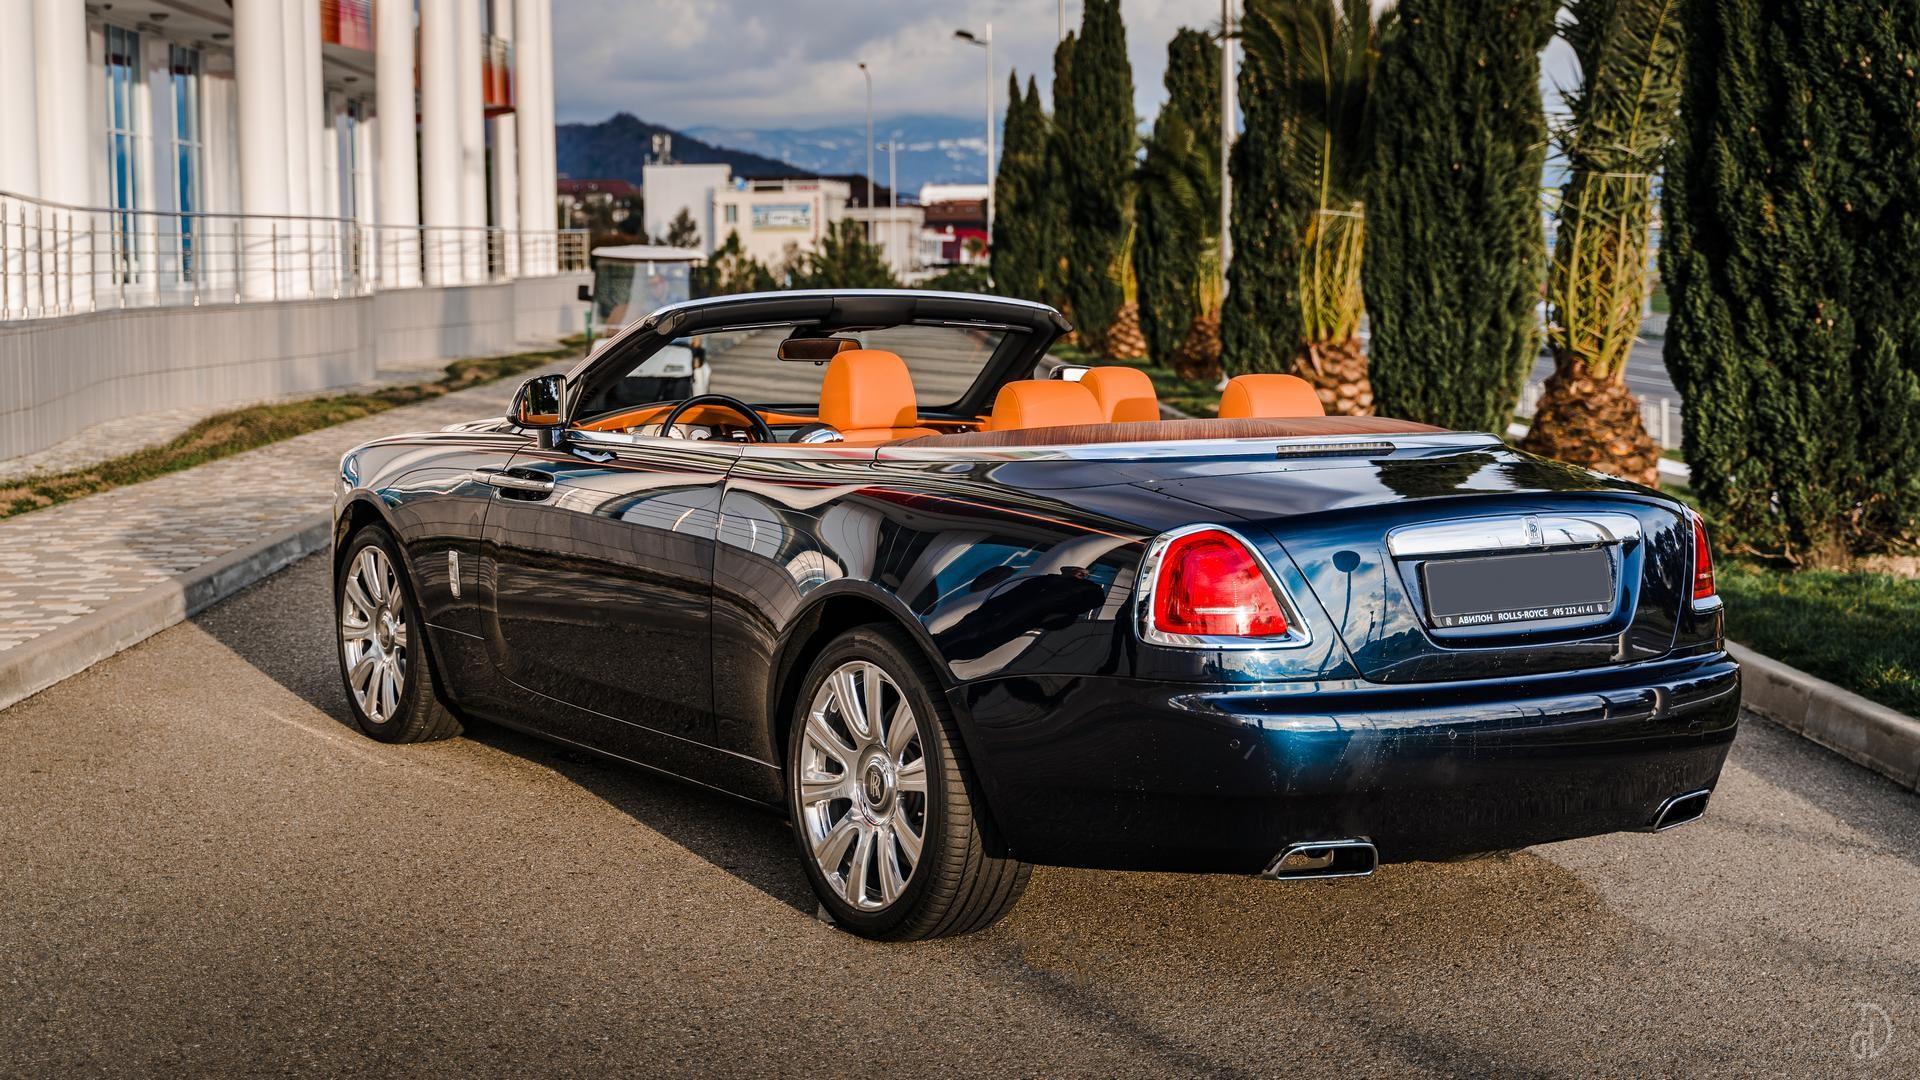 Аренда Rolls-Royce Dawn в Сочи. Фото 5